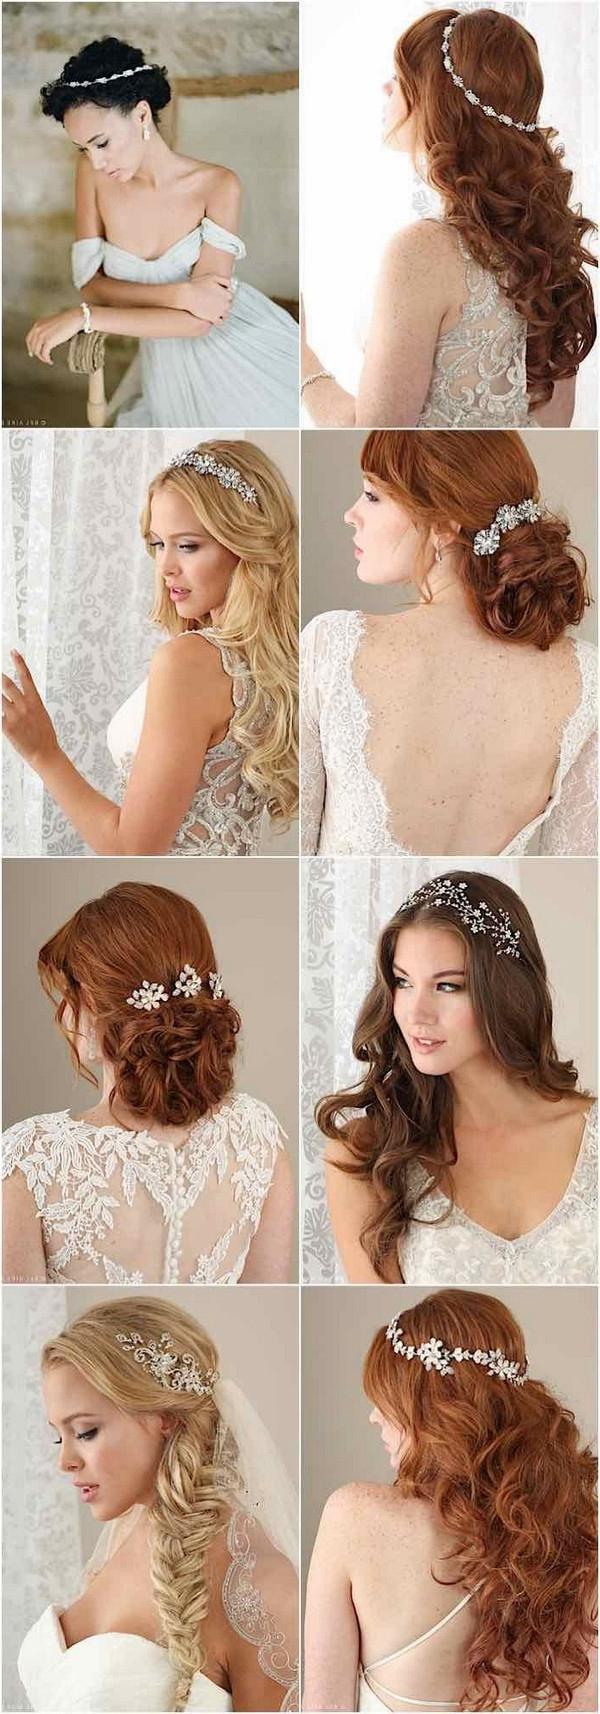 classy-and-elegant-wedding-hairstyles